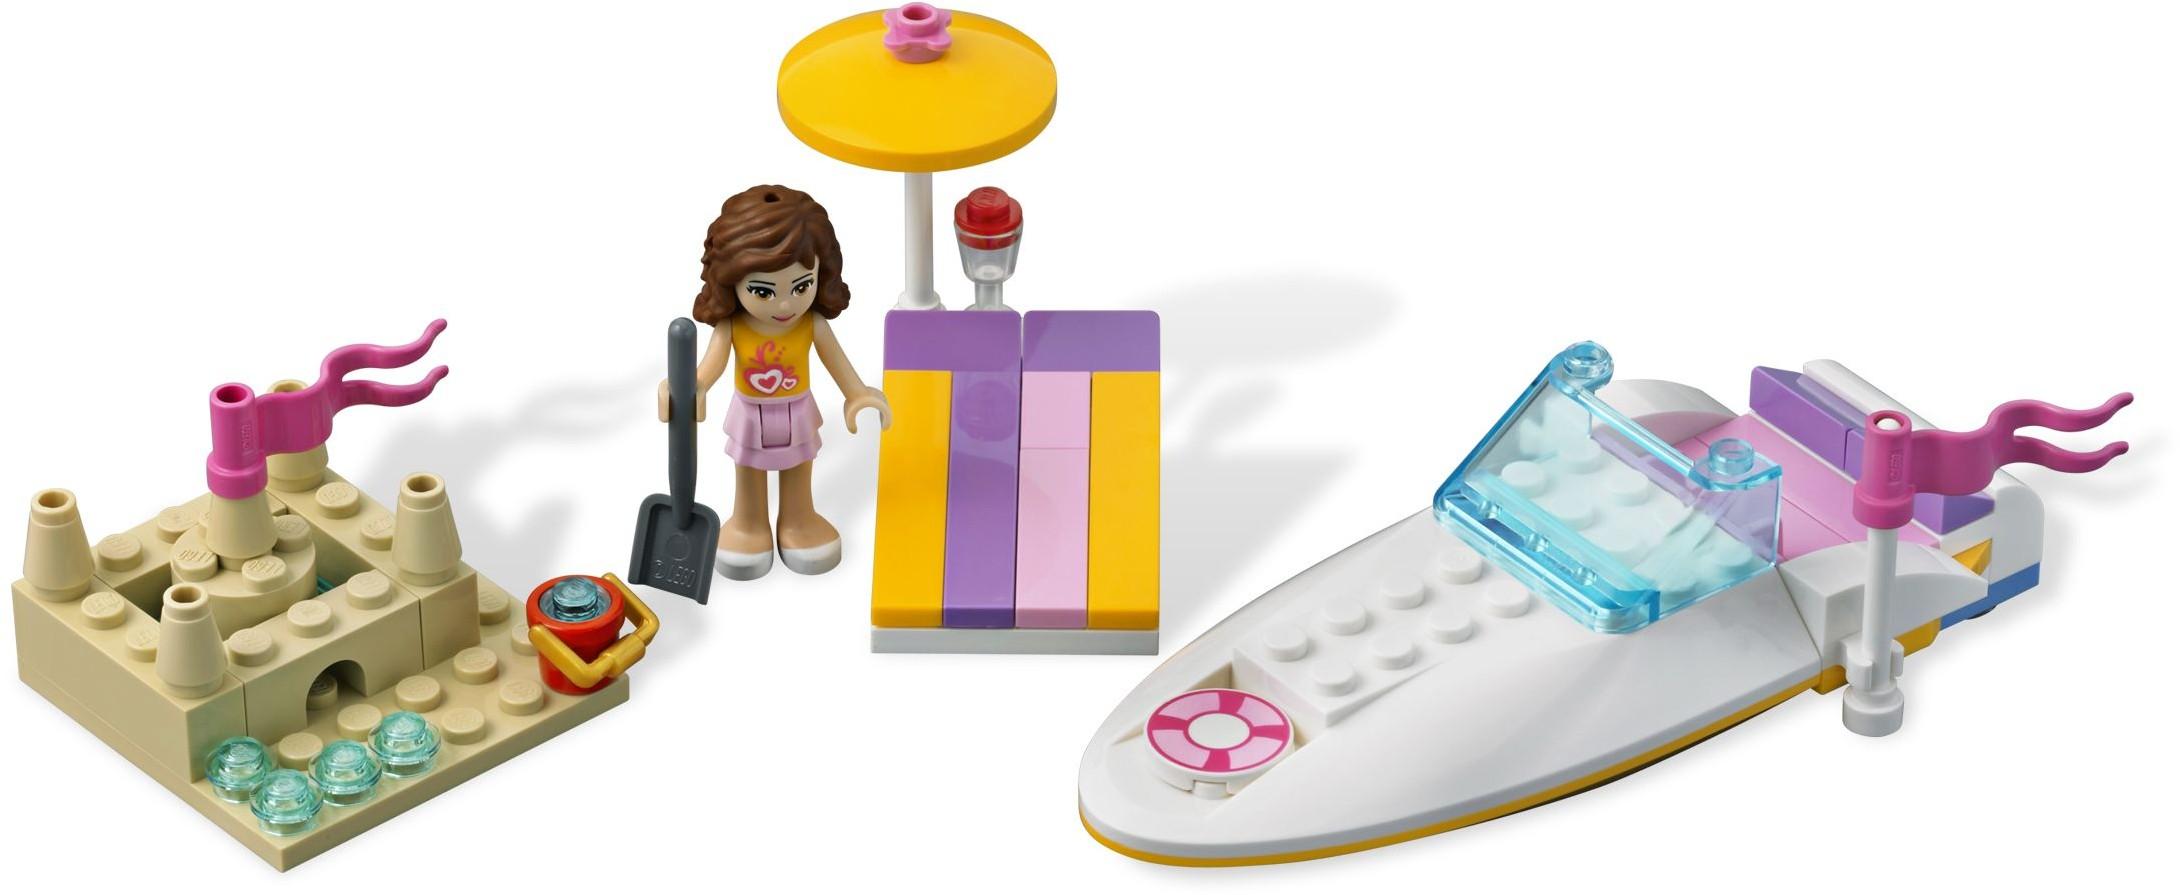 File:Lego-friends-3937-olivias-speedboat 96269 500.jpg